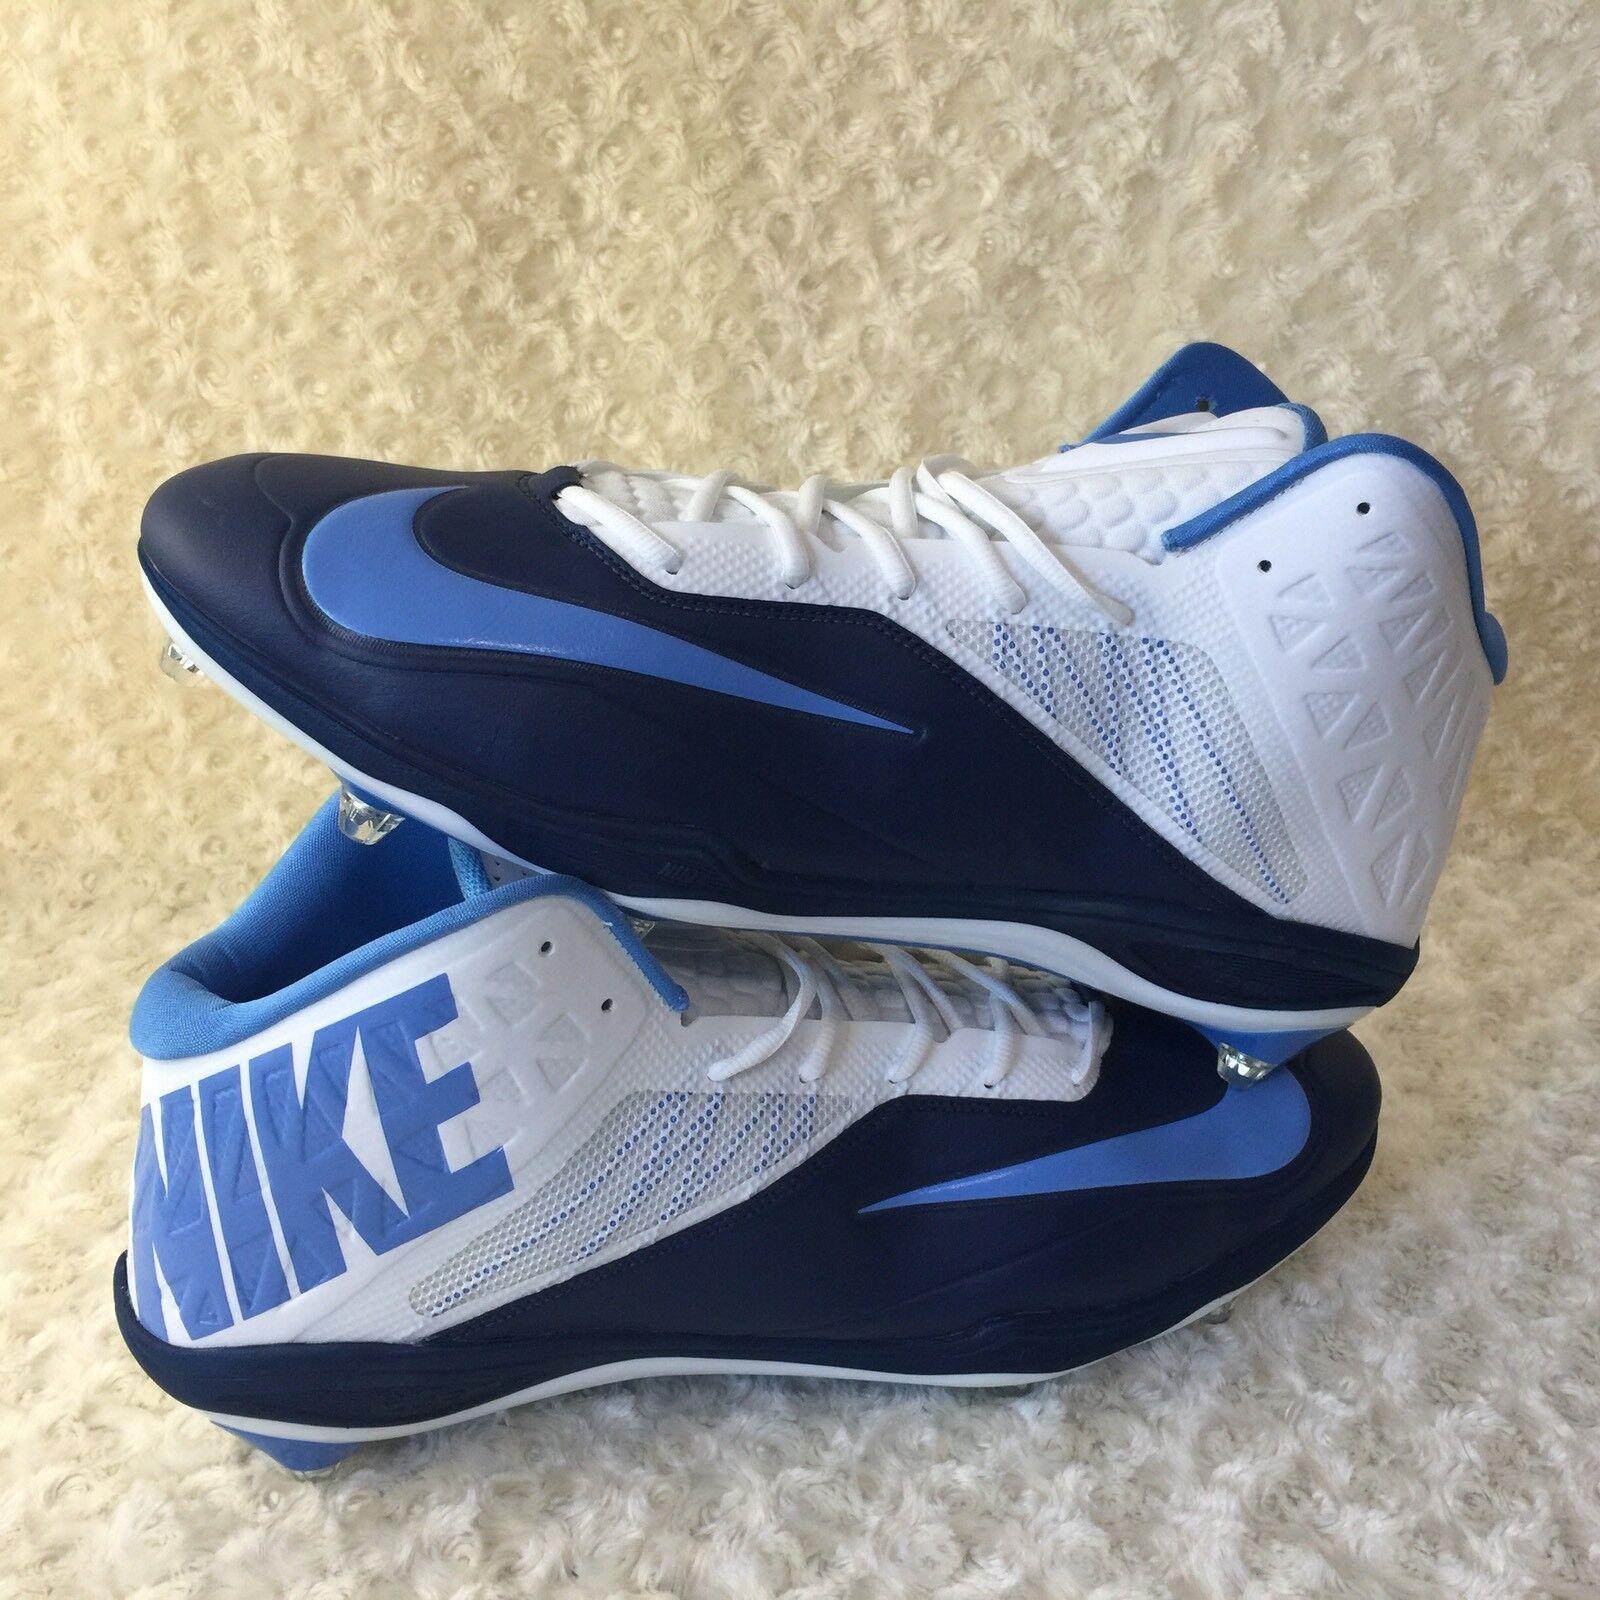 Nike Zoom Code Elite 3/4 Shark Men Sz 18 US Football Cleats Shoes 620501-131 New